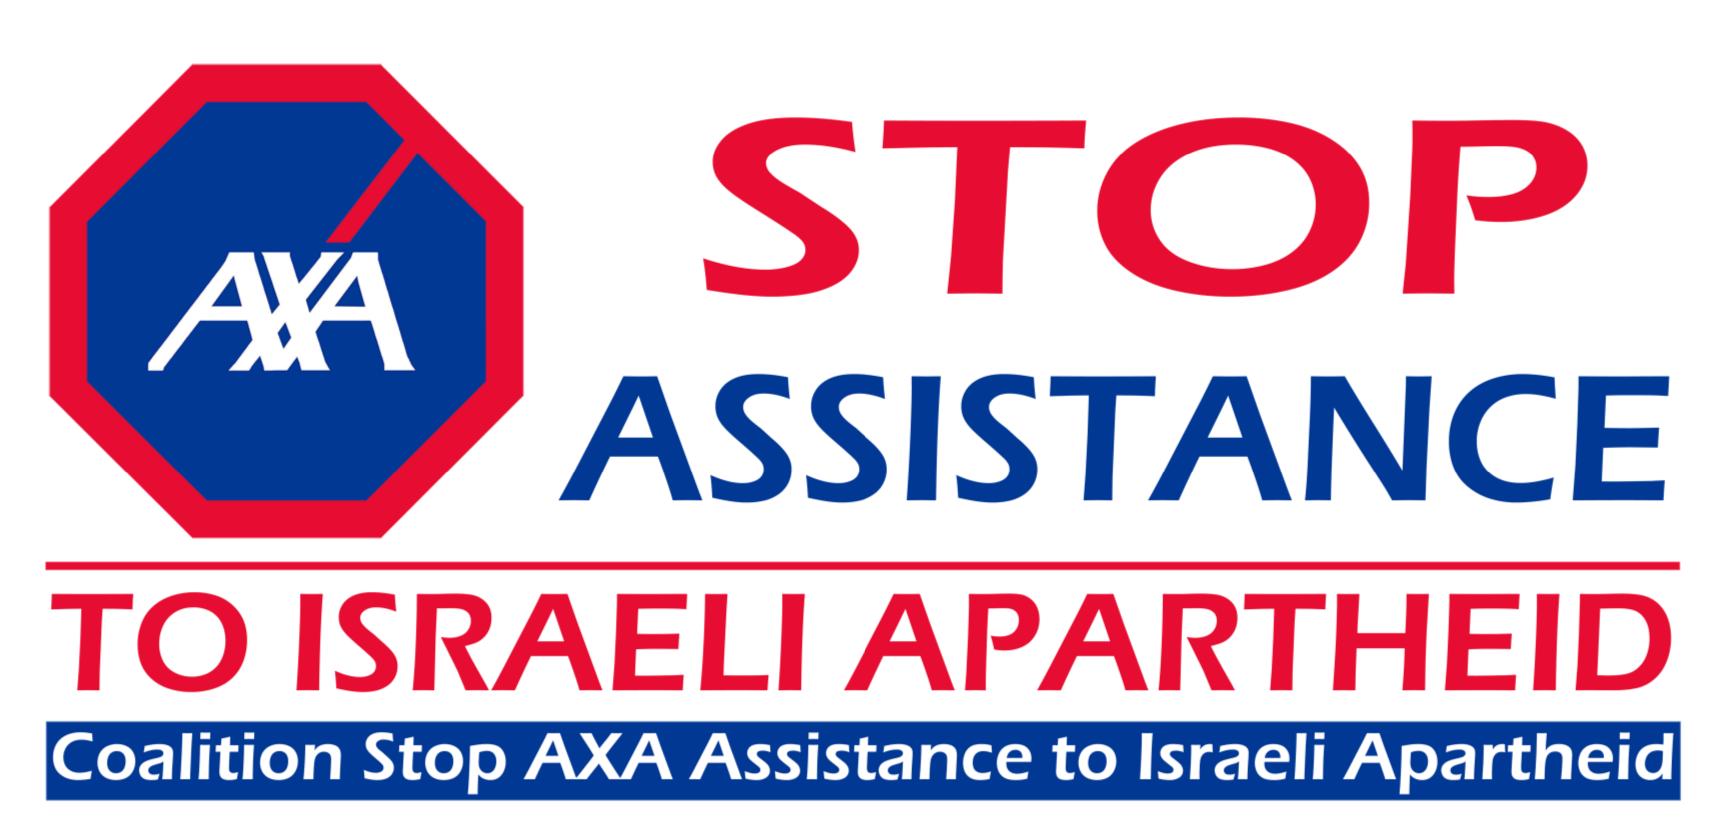 Des militants belges demandent à AXA Insurance de cesser d'investir dans l'apartheid israélien